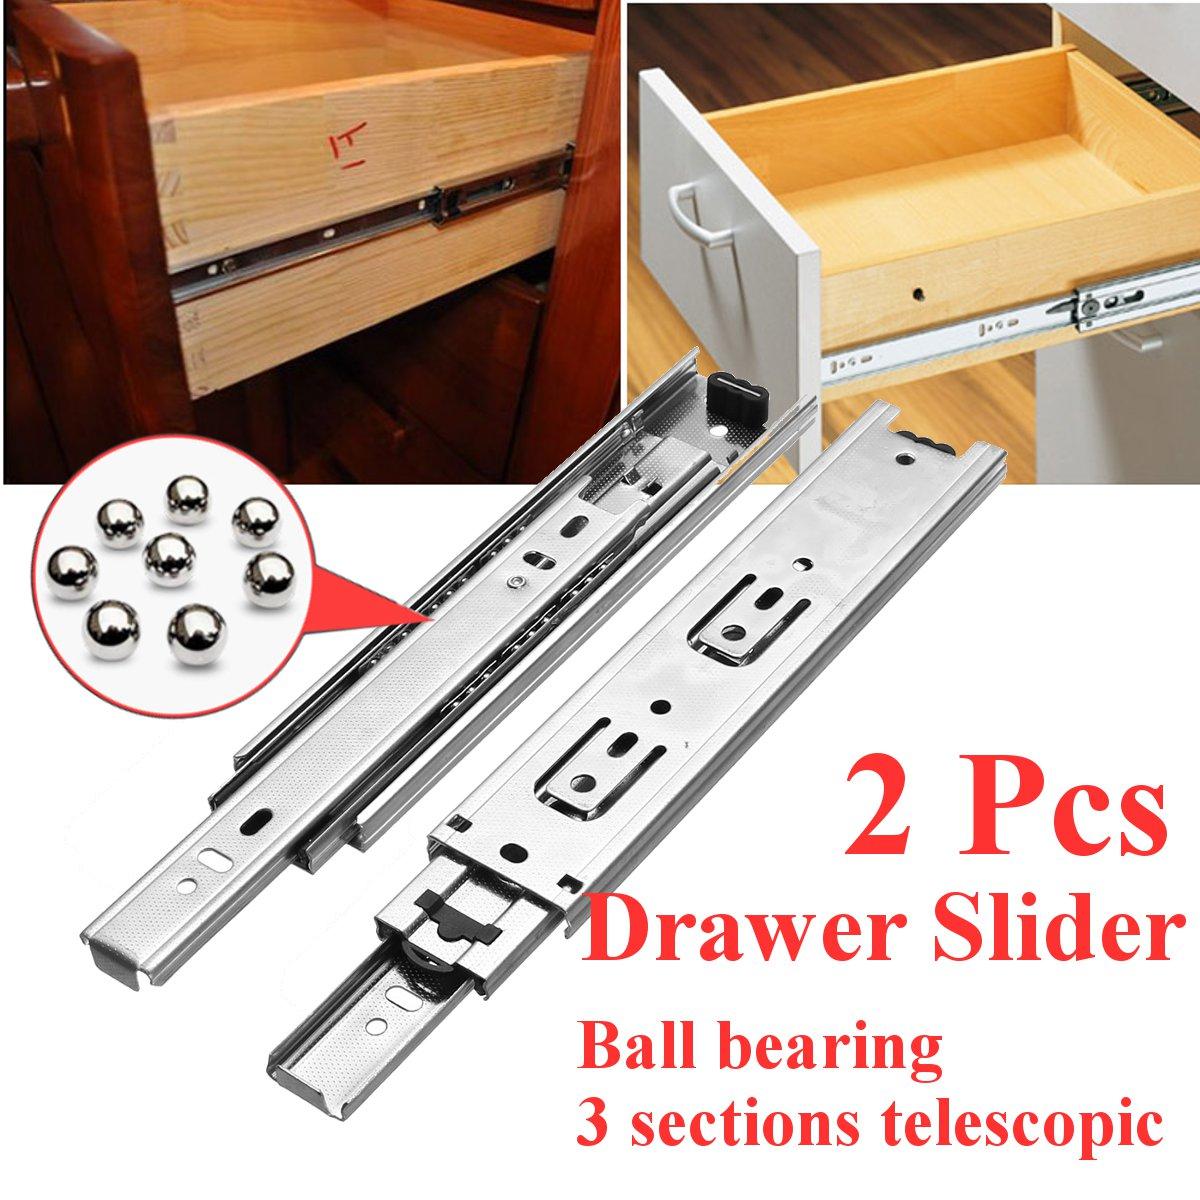 1Pair Drawer Steel Ball Rail Slide Drawer Slide Ball Guide 3 Section Wide Steel Fold Furniture Hardware Fittings